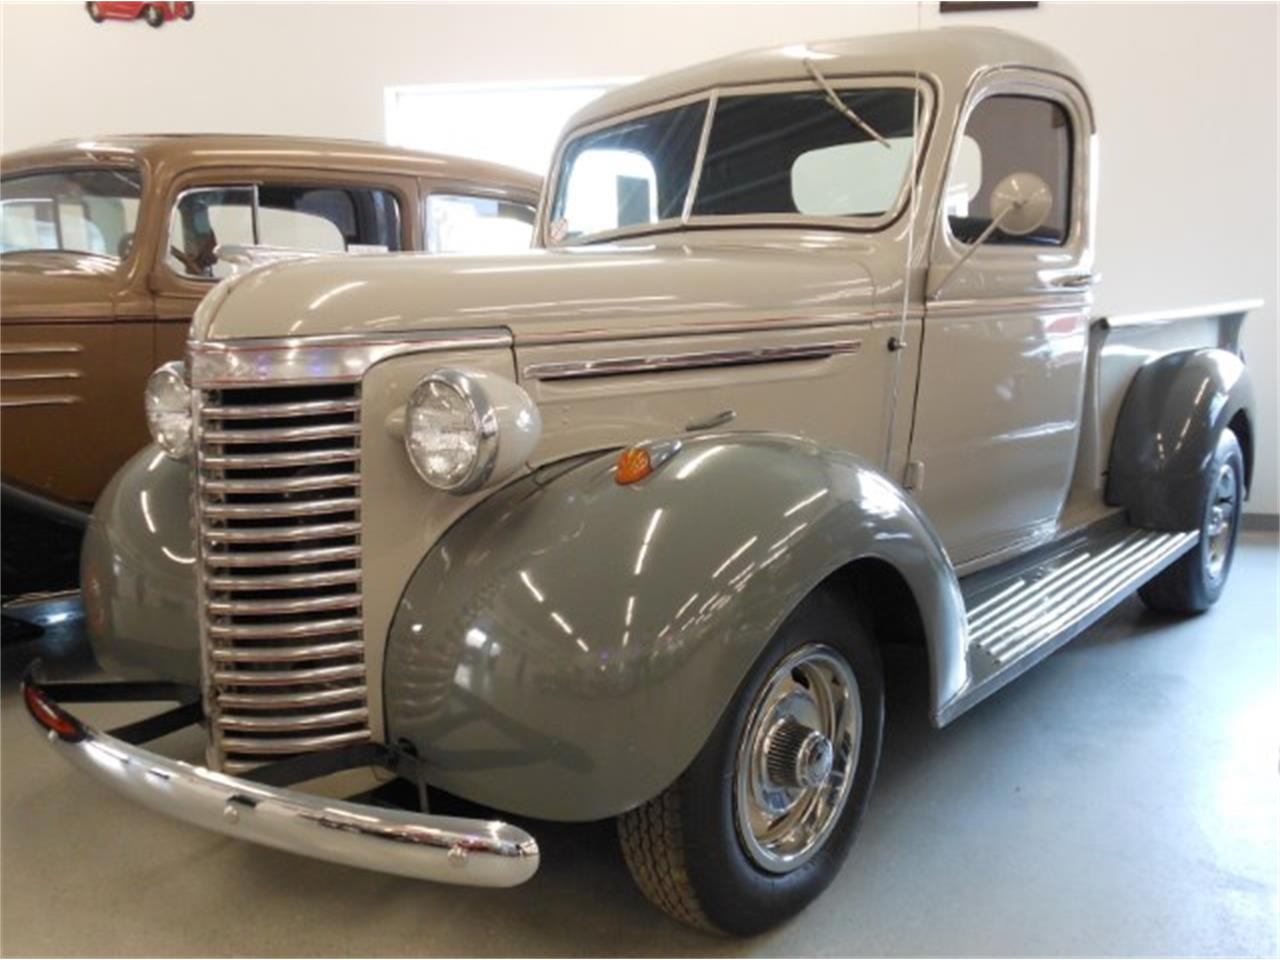 For Sale 1940 Chevrolet Pickup In Corning Iowa